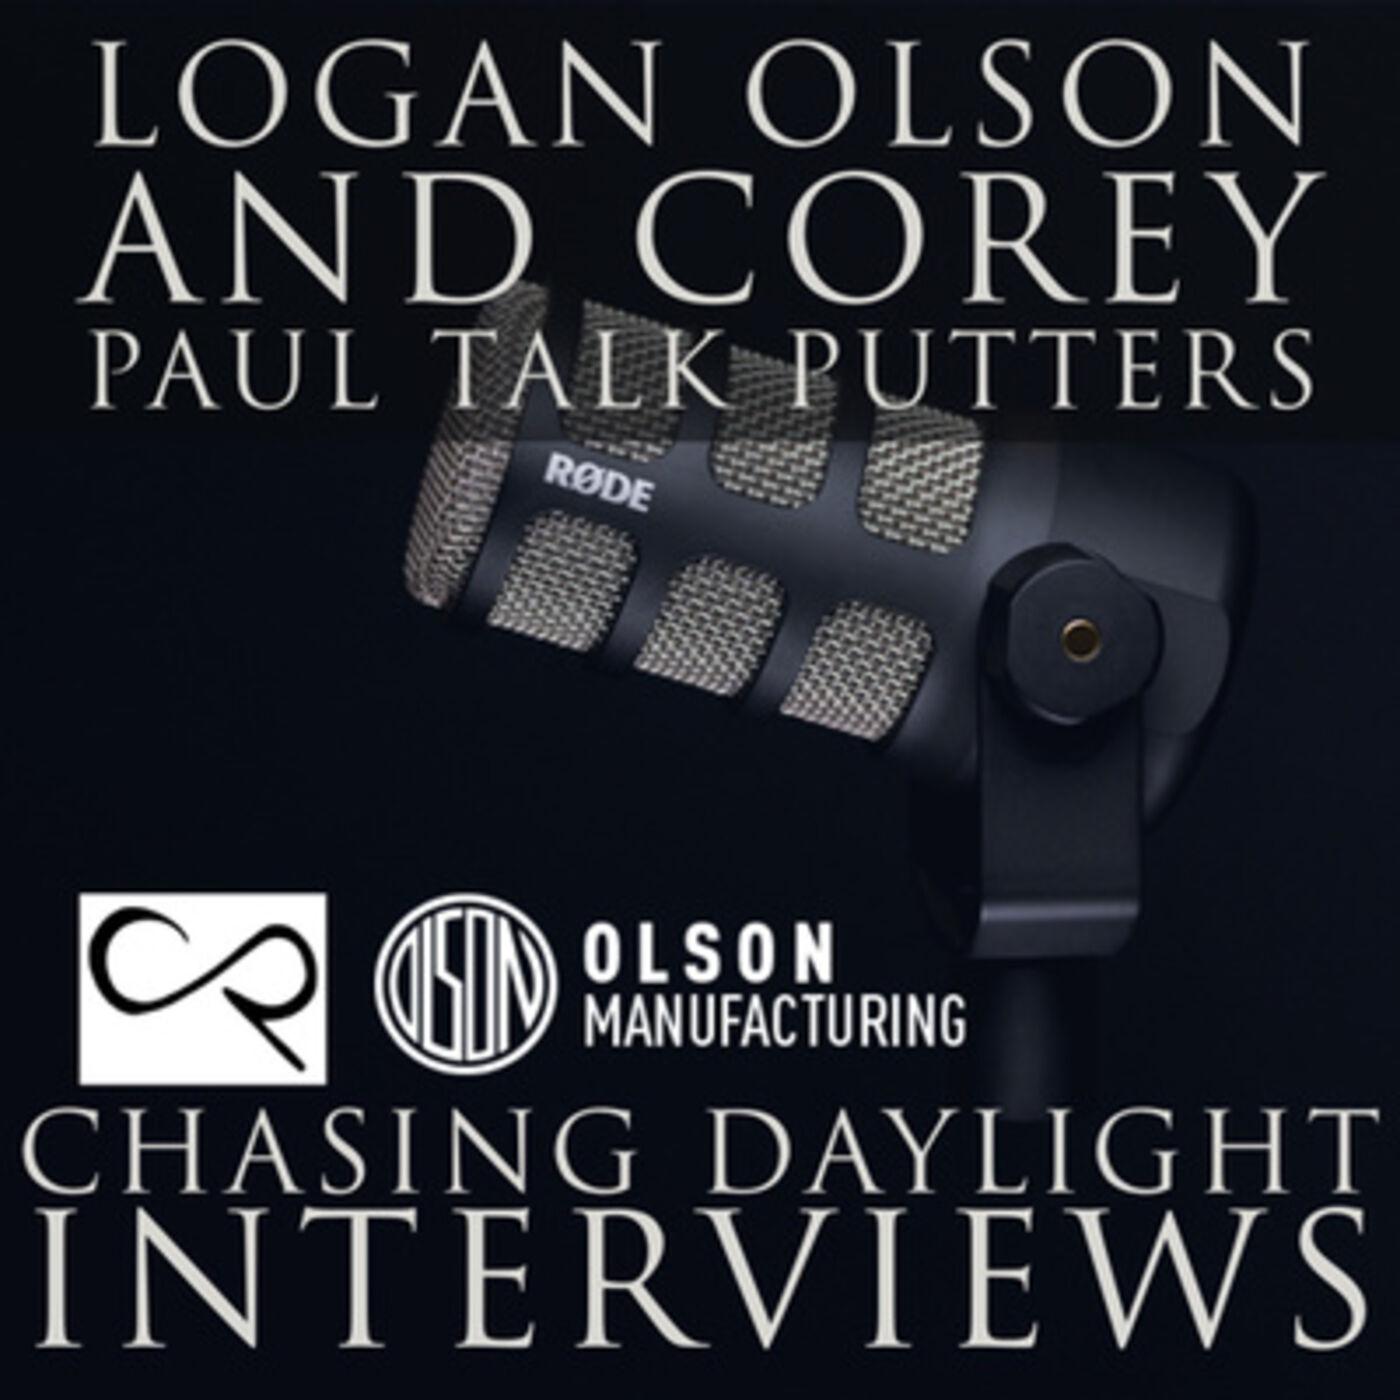 E10: Logan Olson and Corey Paul